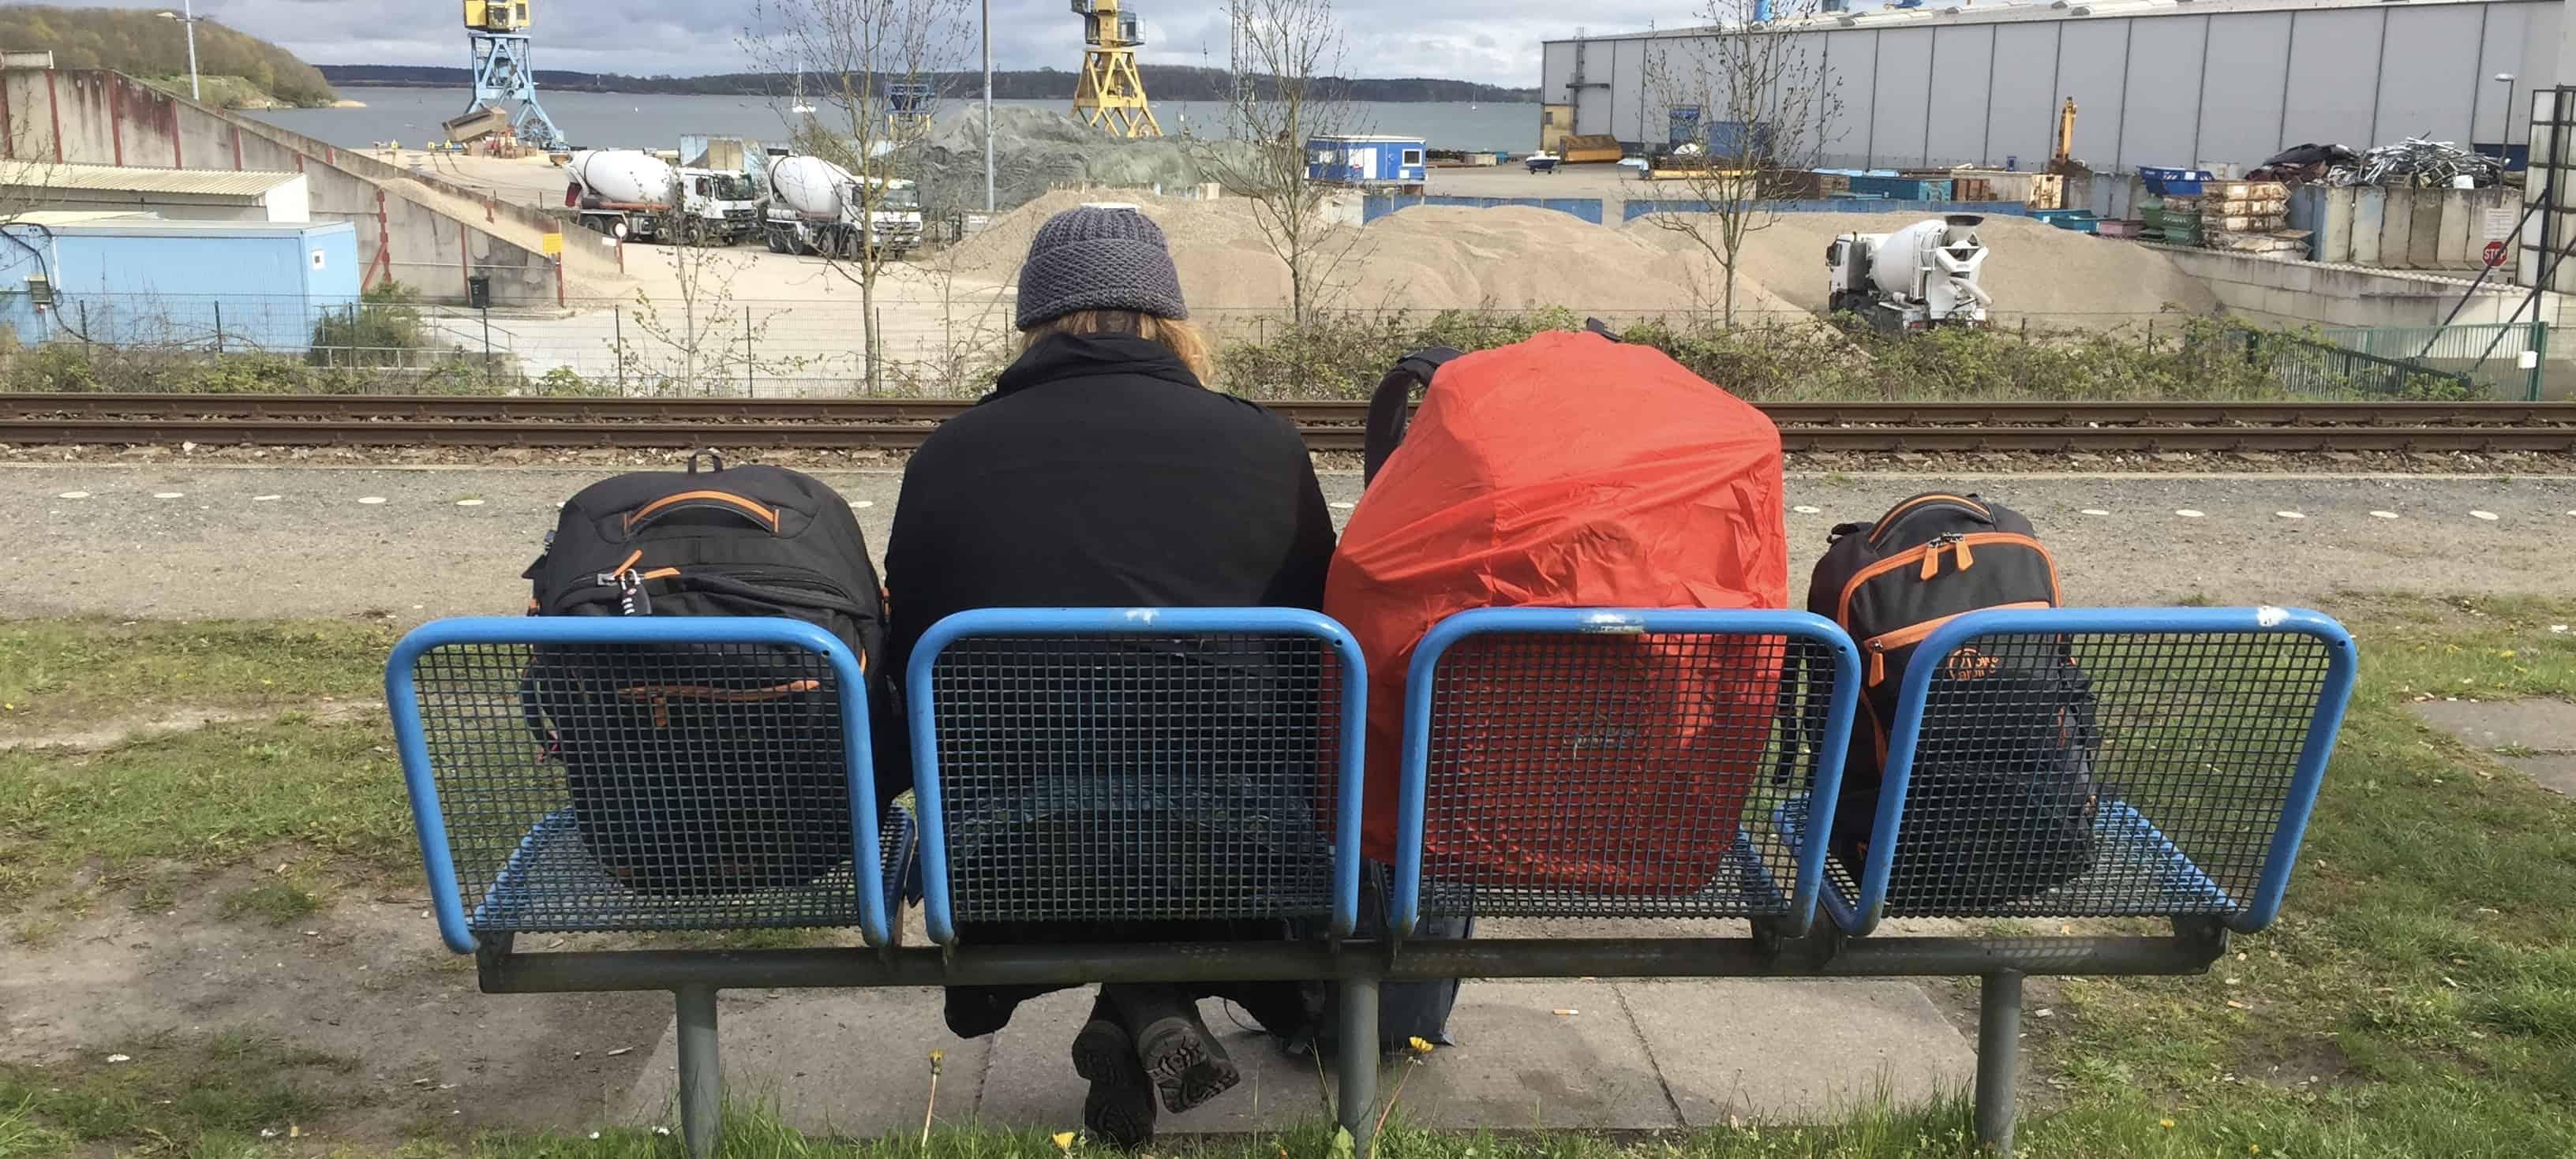 Stralsund Train Station Hannah Cox betternotstop